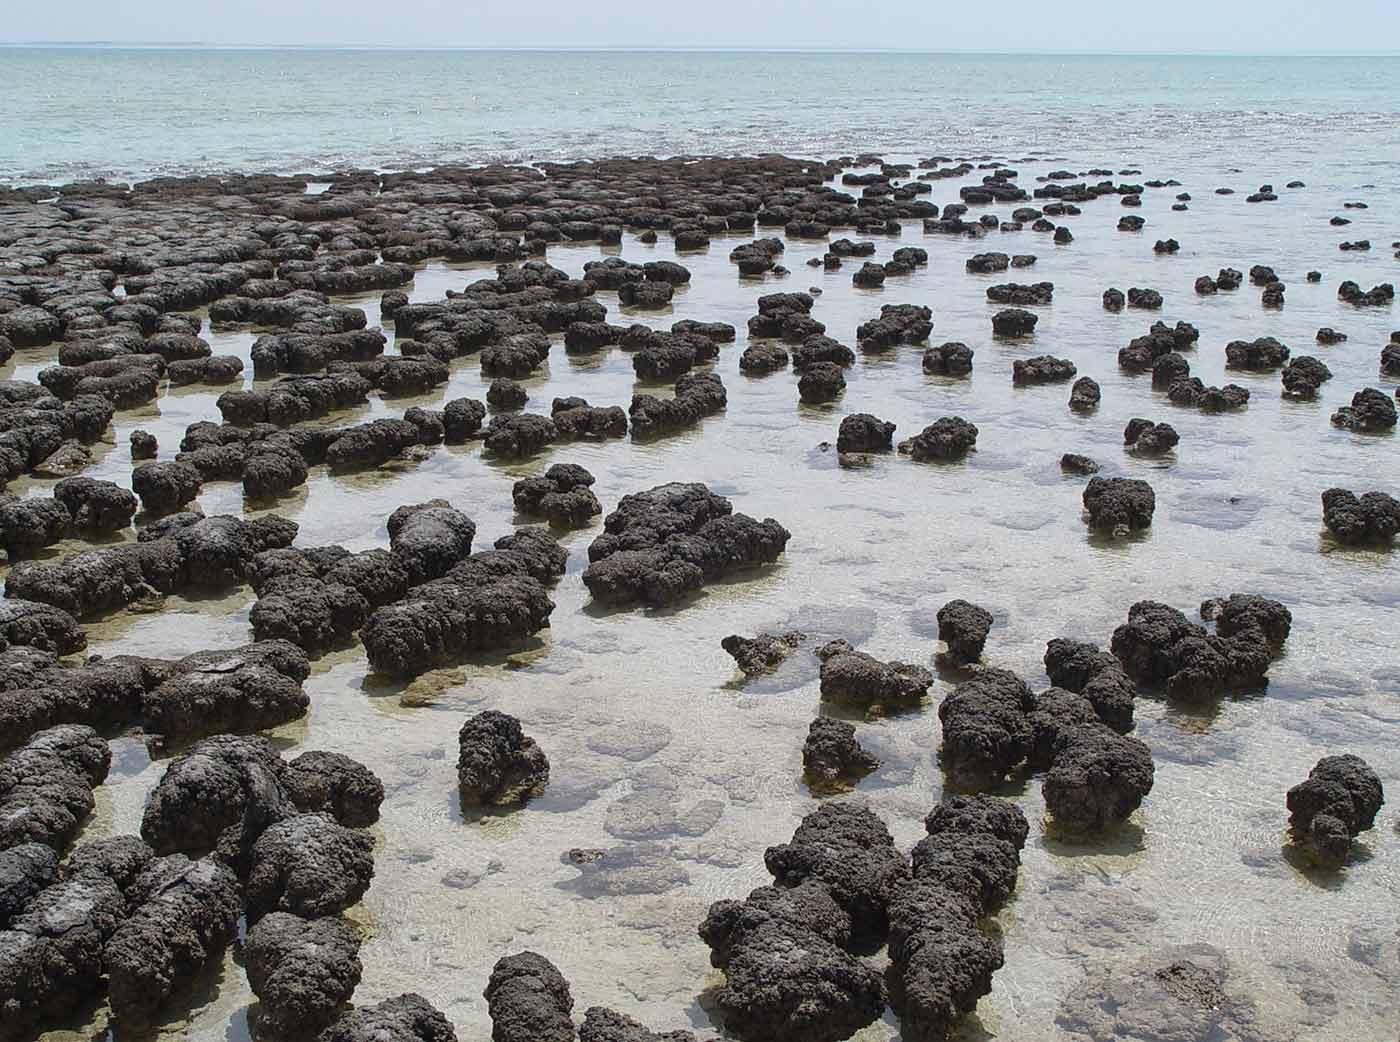 Clusters of stromatolites growing in Hamelin Pool Marine Nature Reserve, Shark Bay in Western Australia.